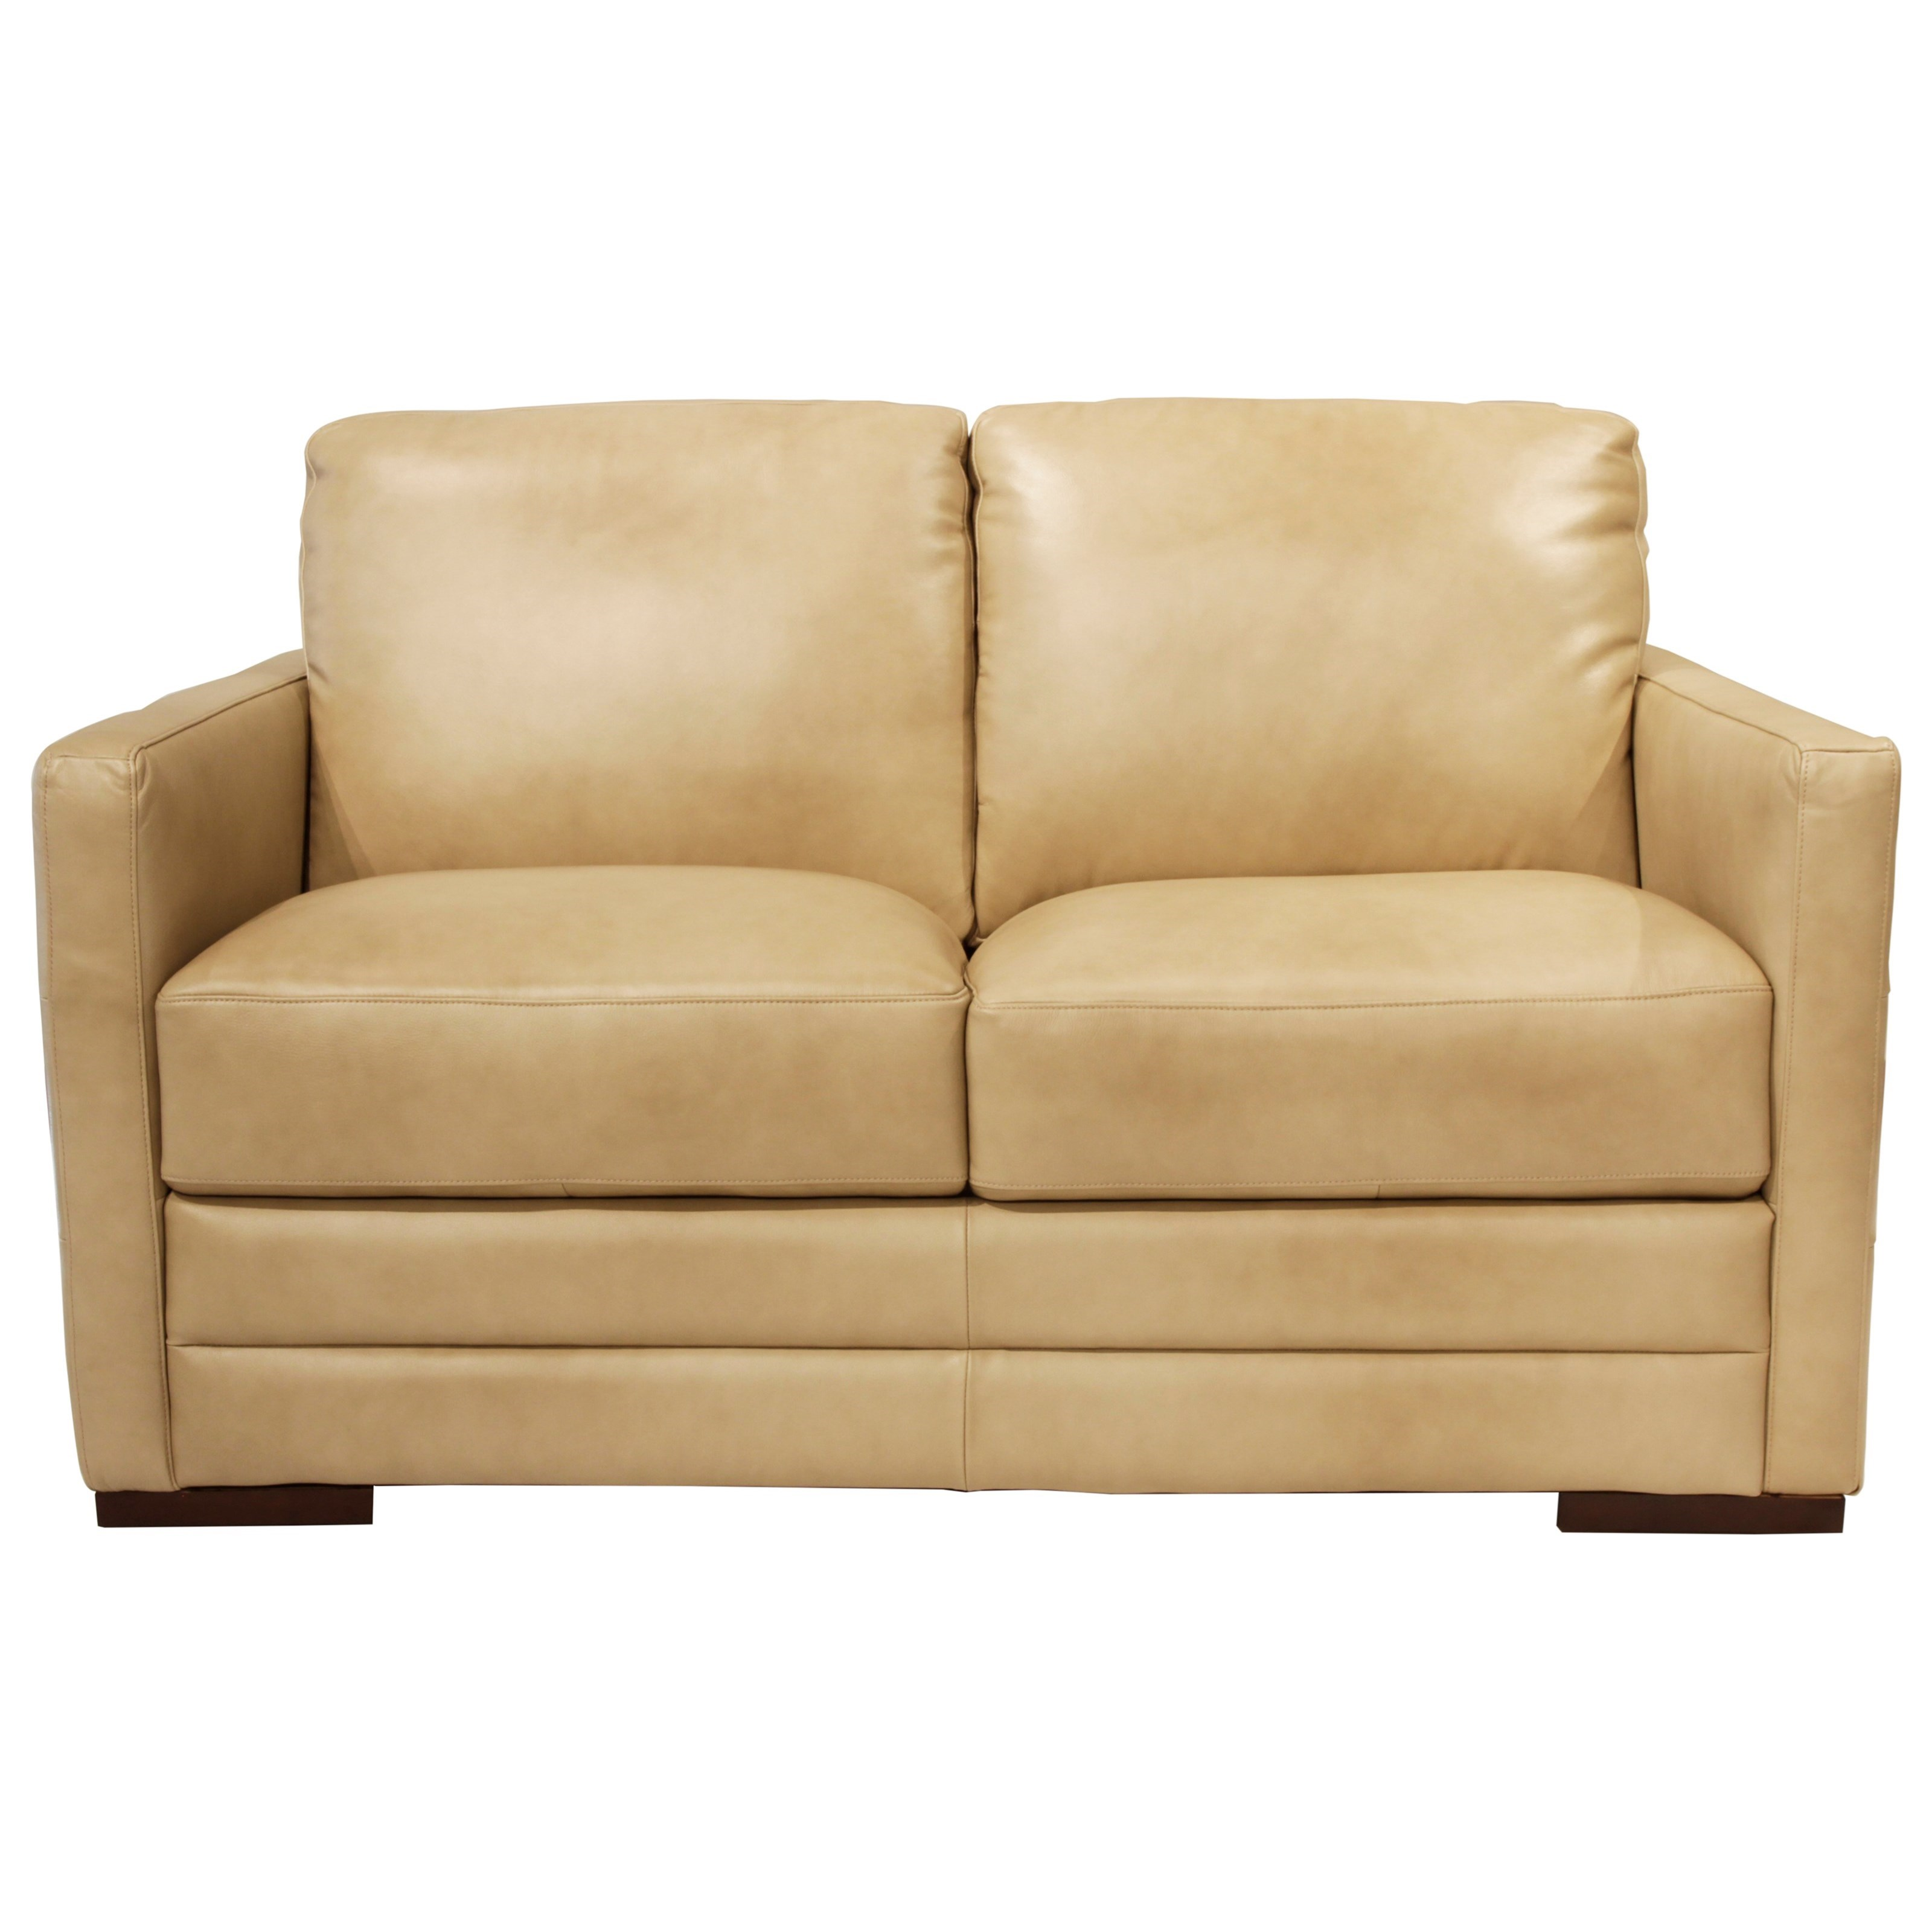 Futura Leather Monica Loveseat Abode Love Seats